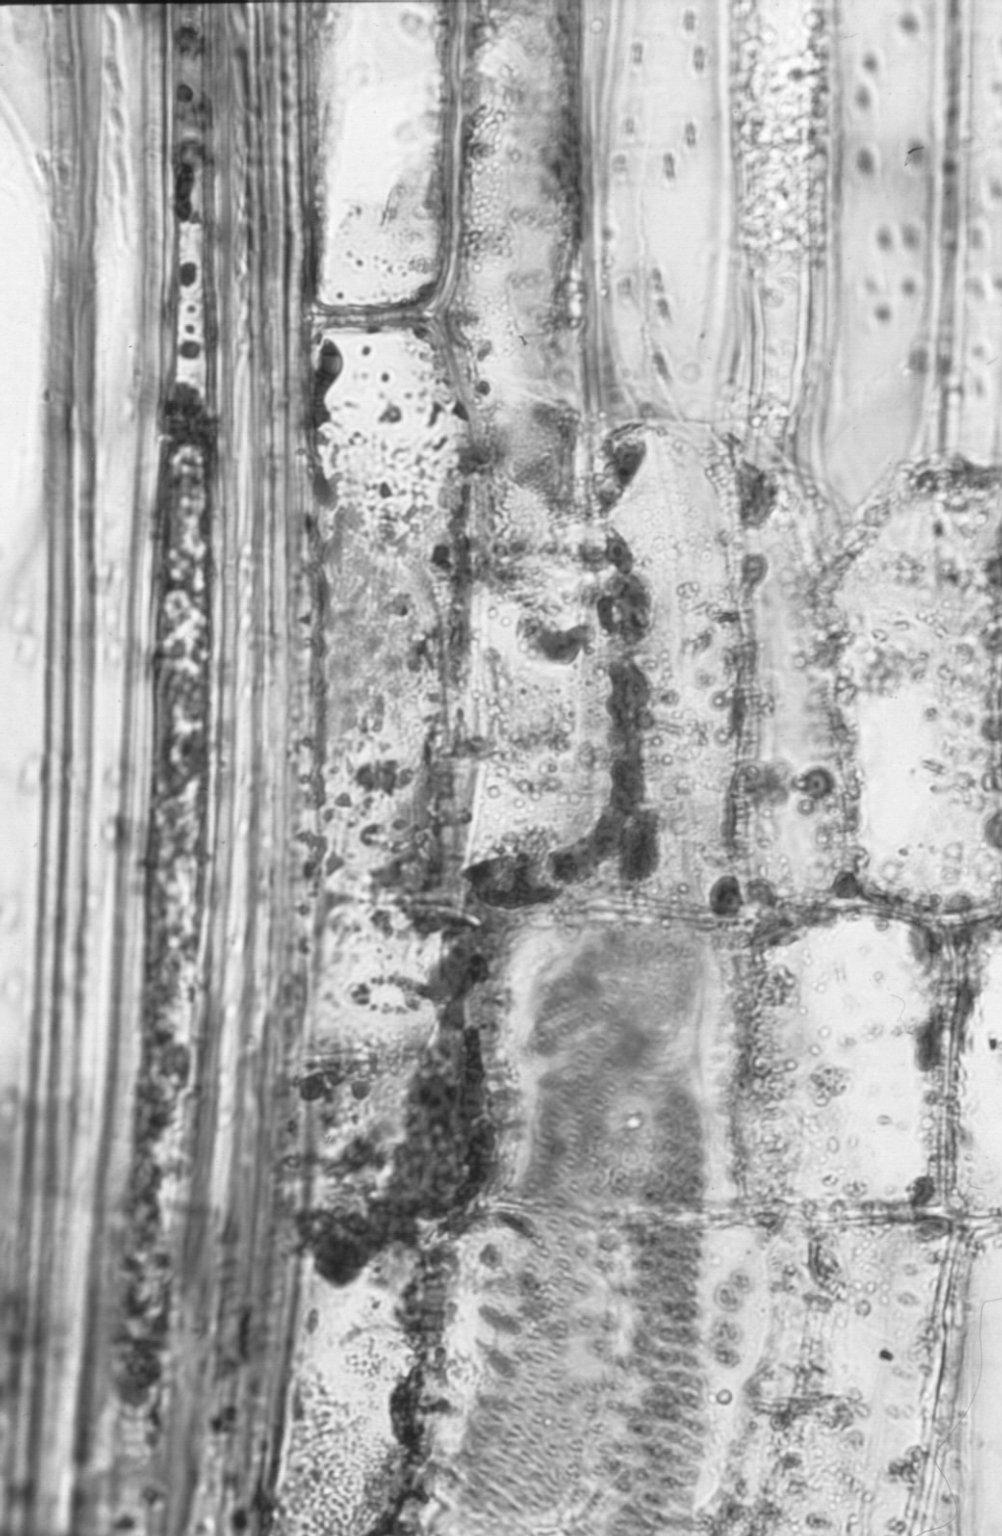 LOGANIACEAE Neuburgia corynocarpa